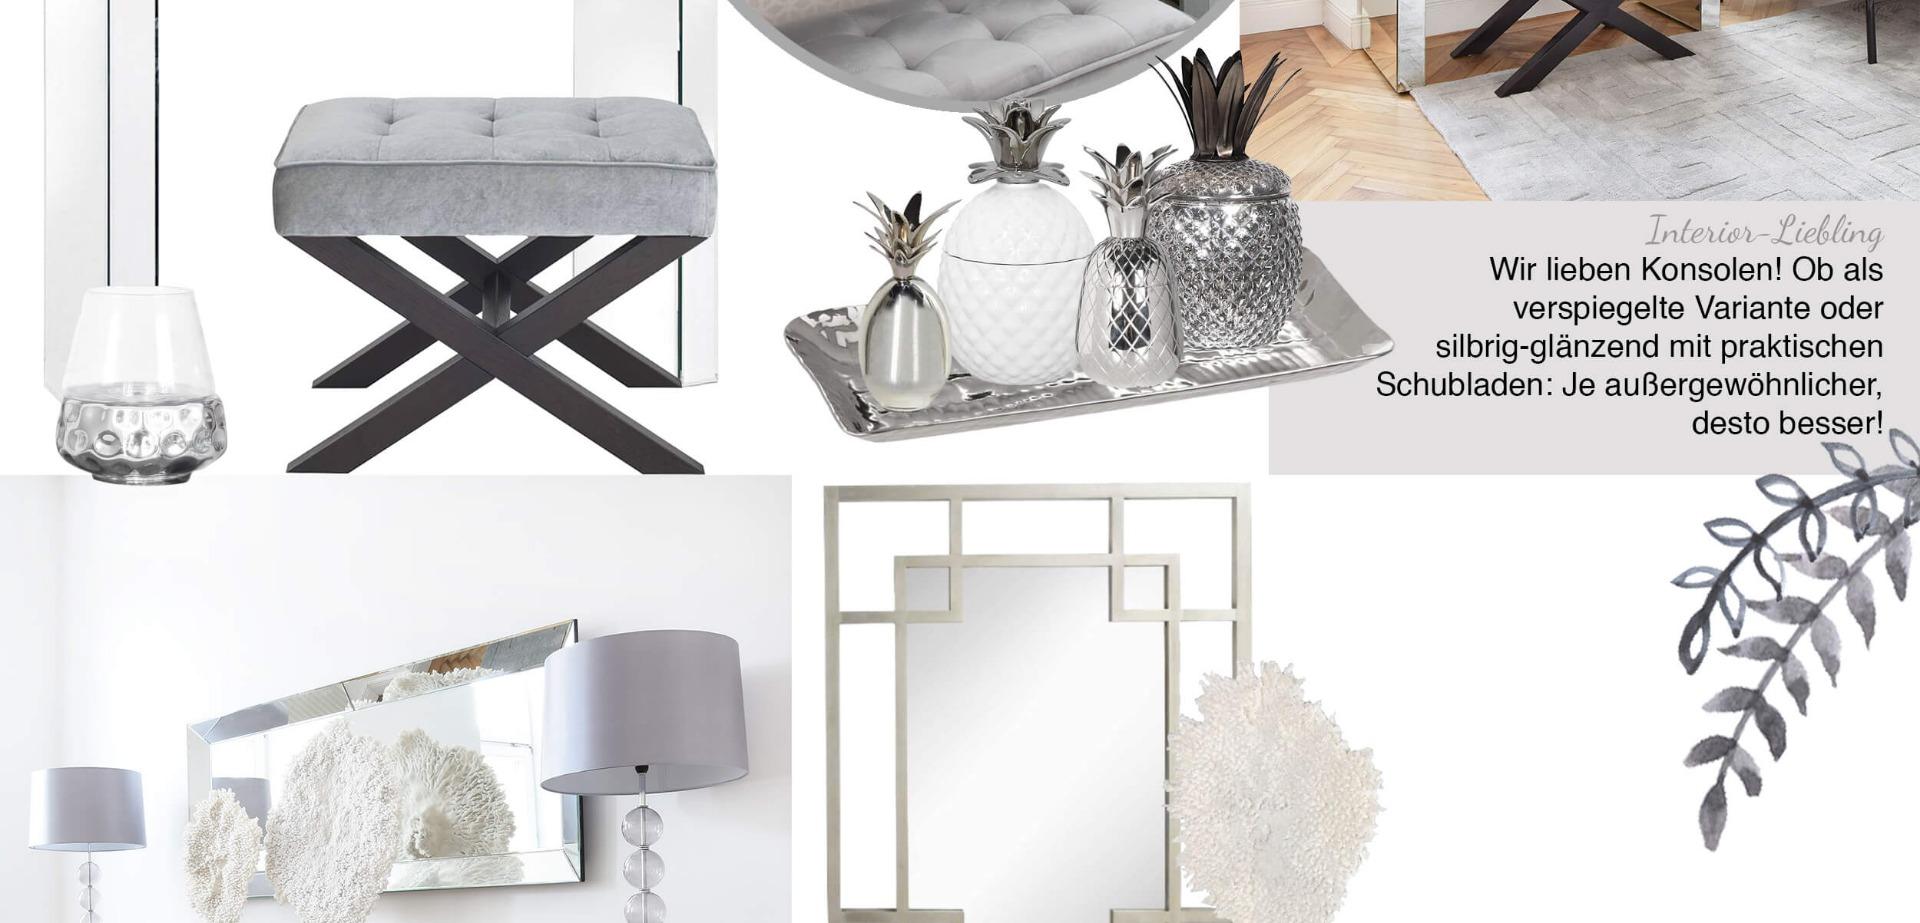 Urban Loft Livingroom - Wohnzimmer in Silber & Grau - Looks